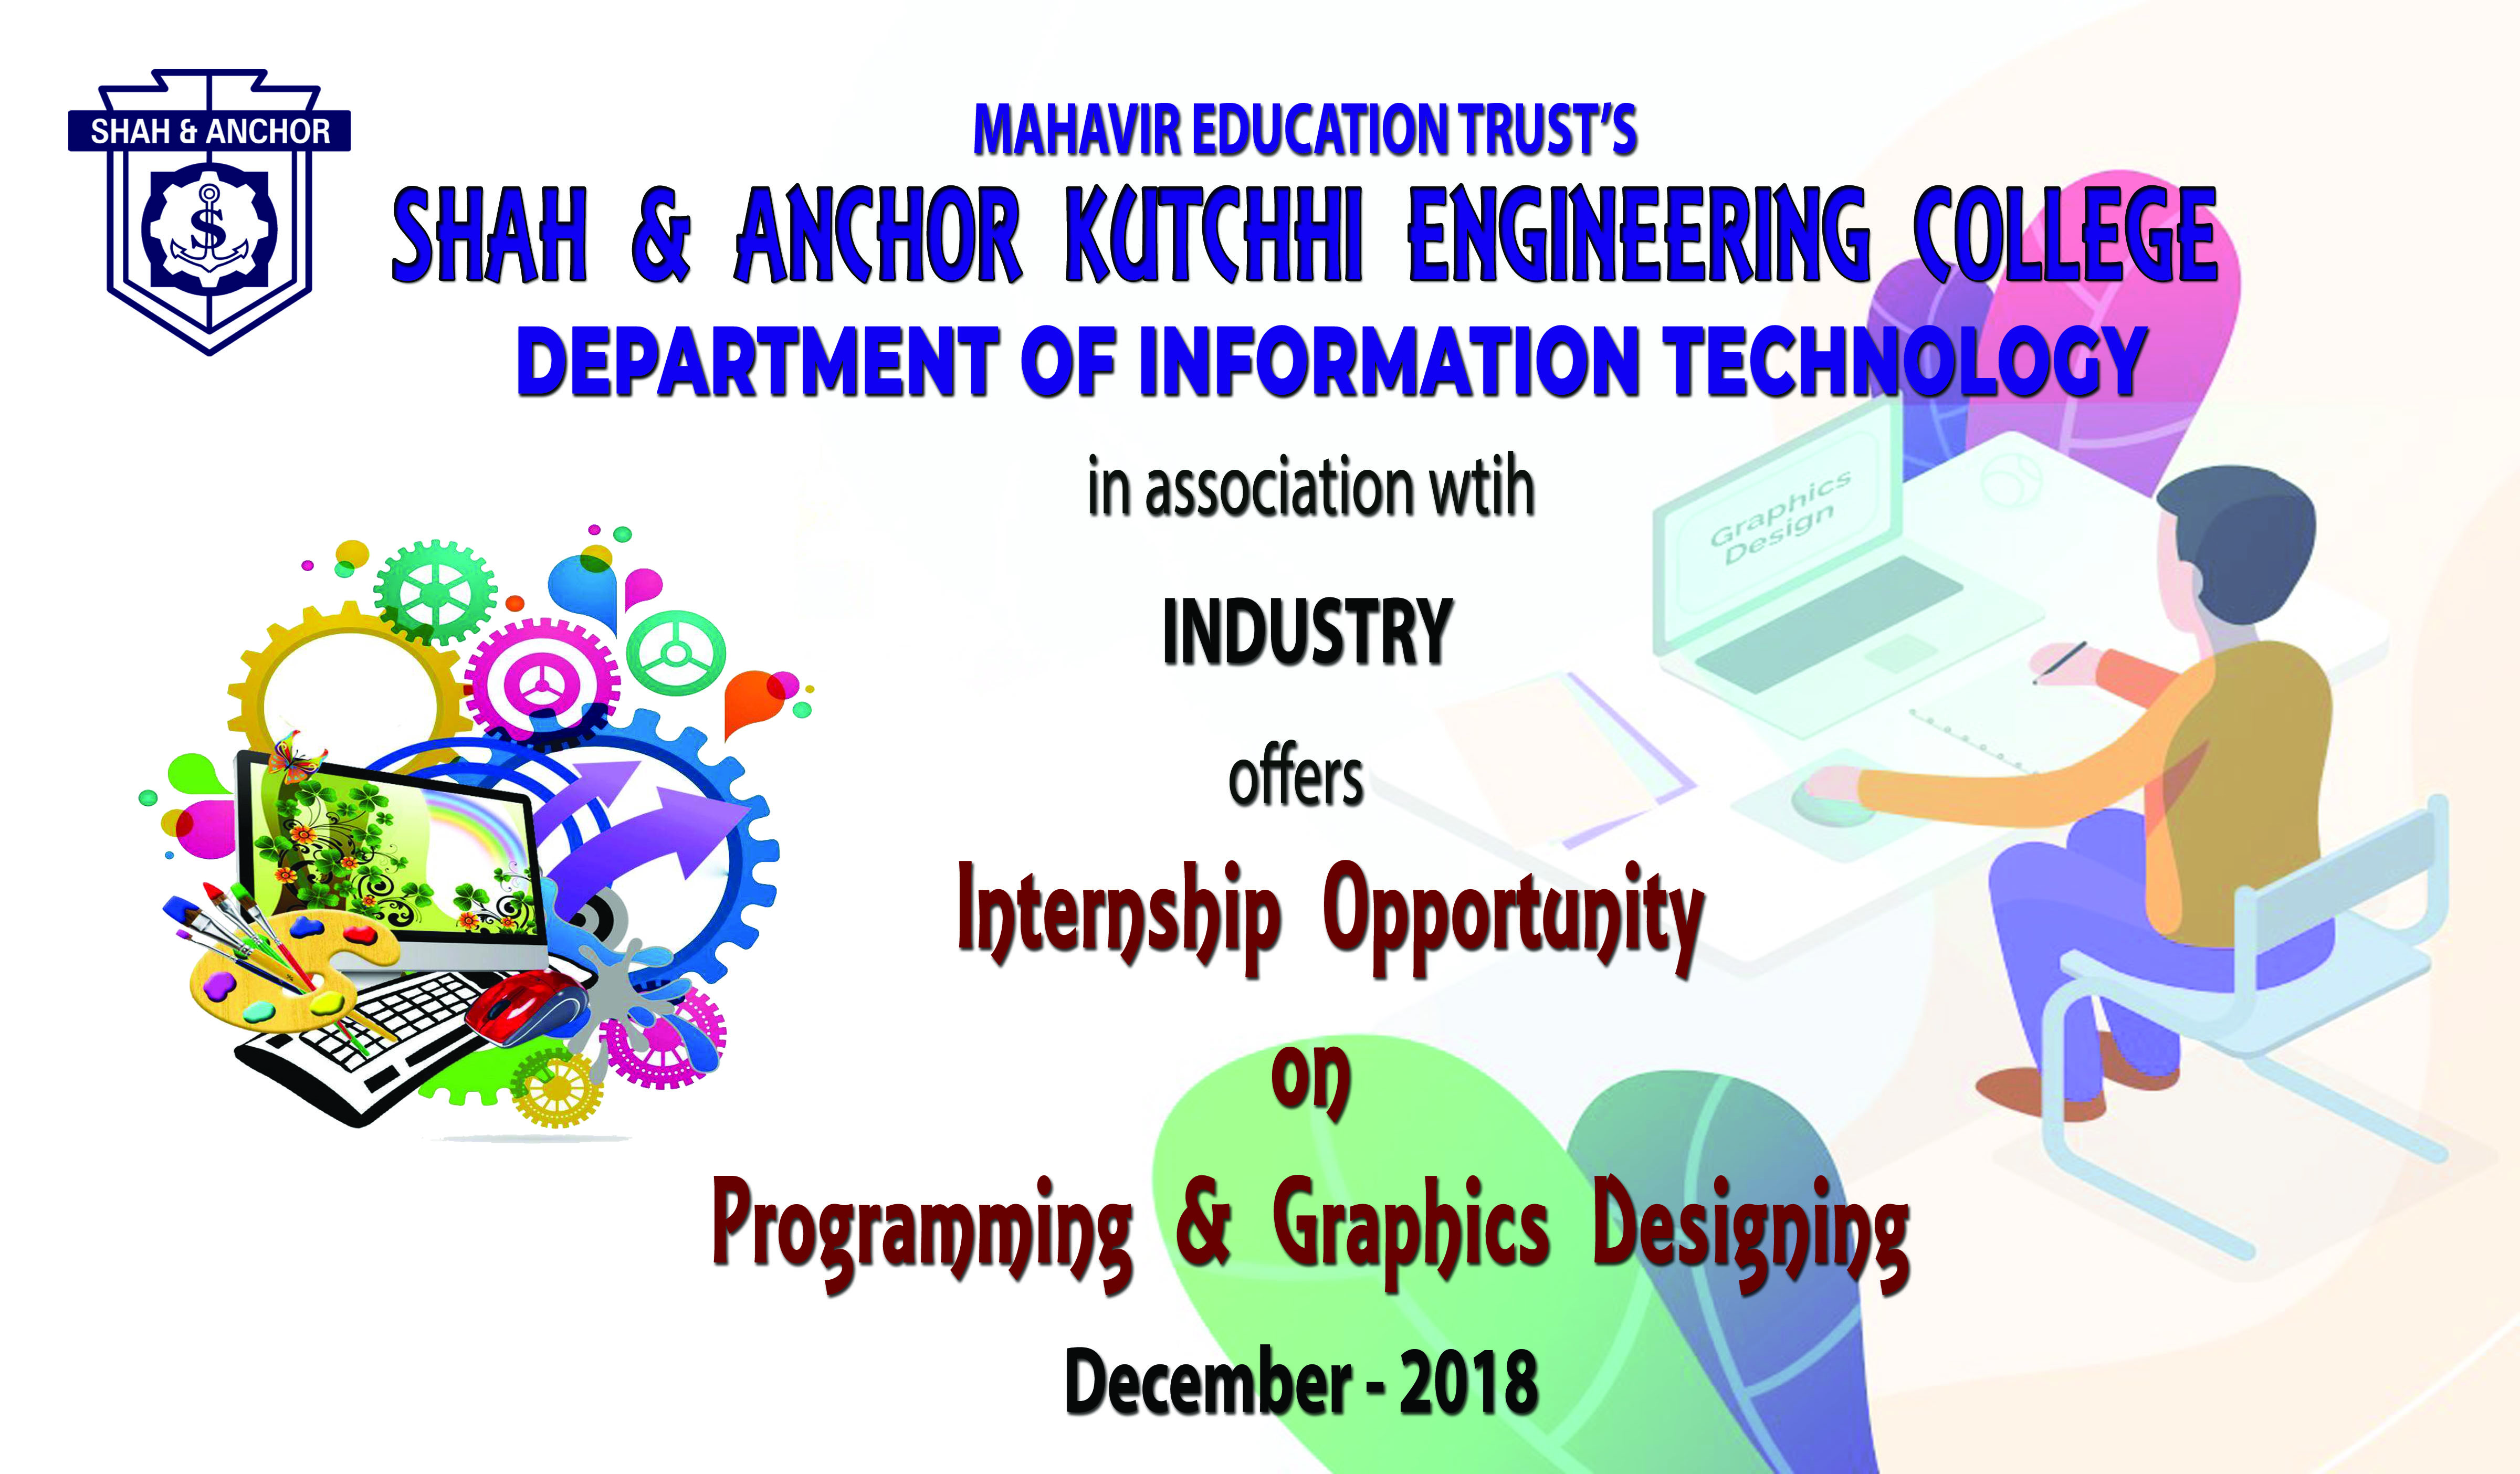 Internship program on Programming & Graphics Designing